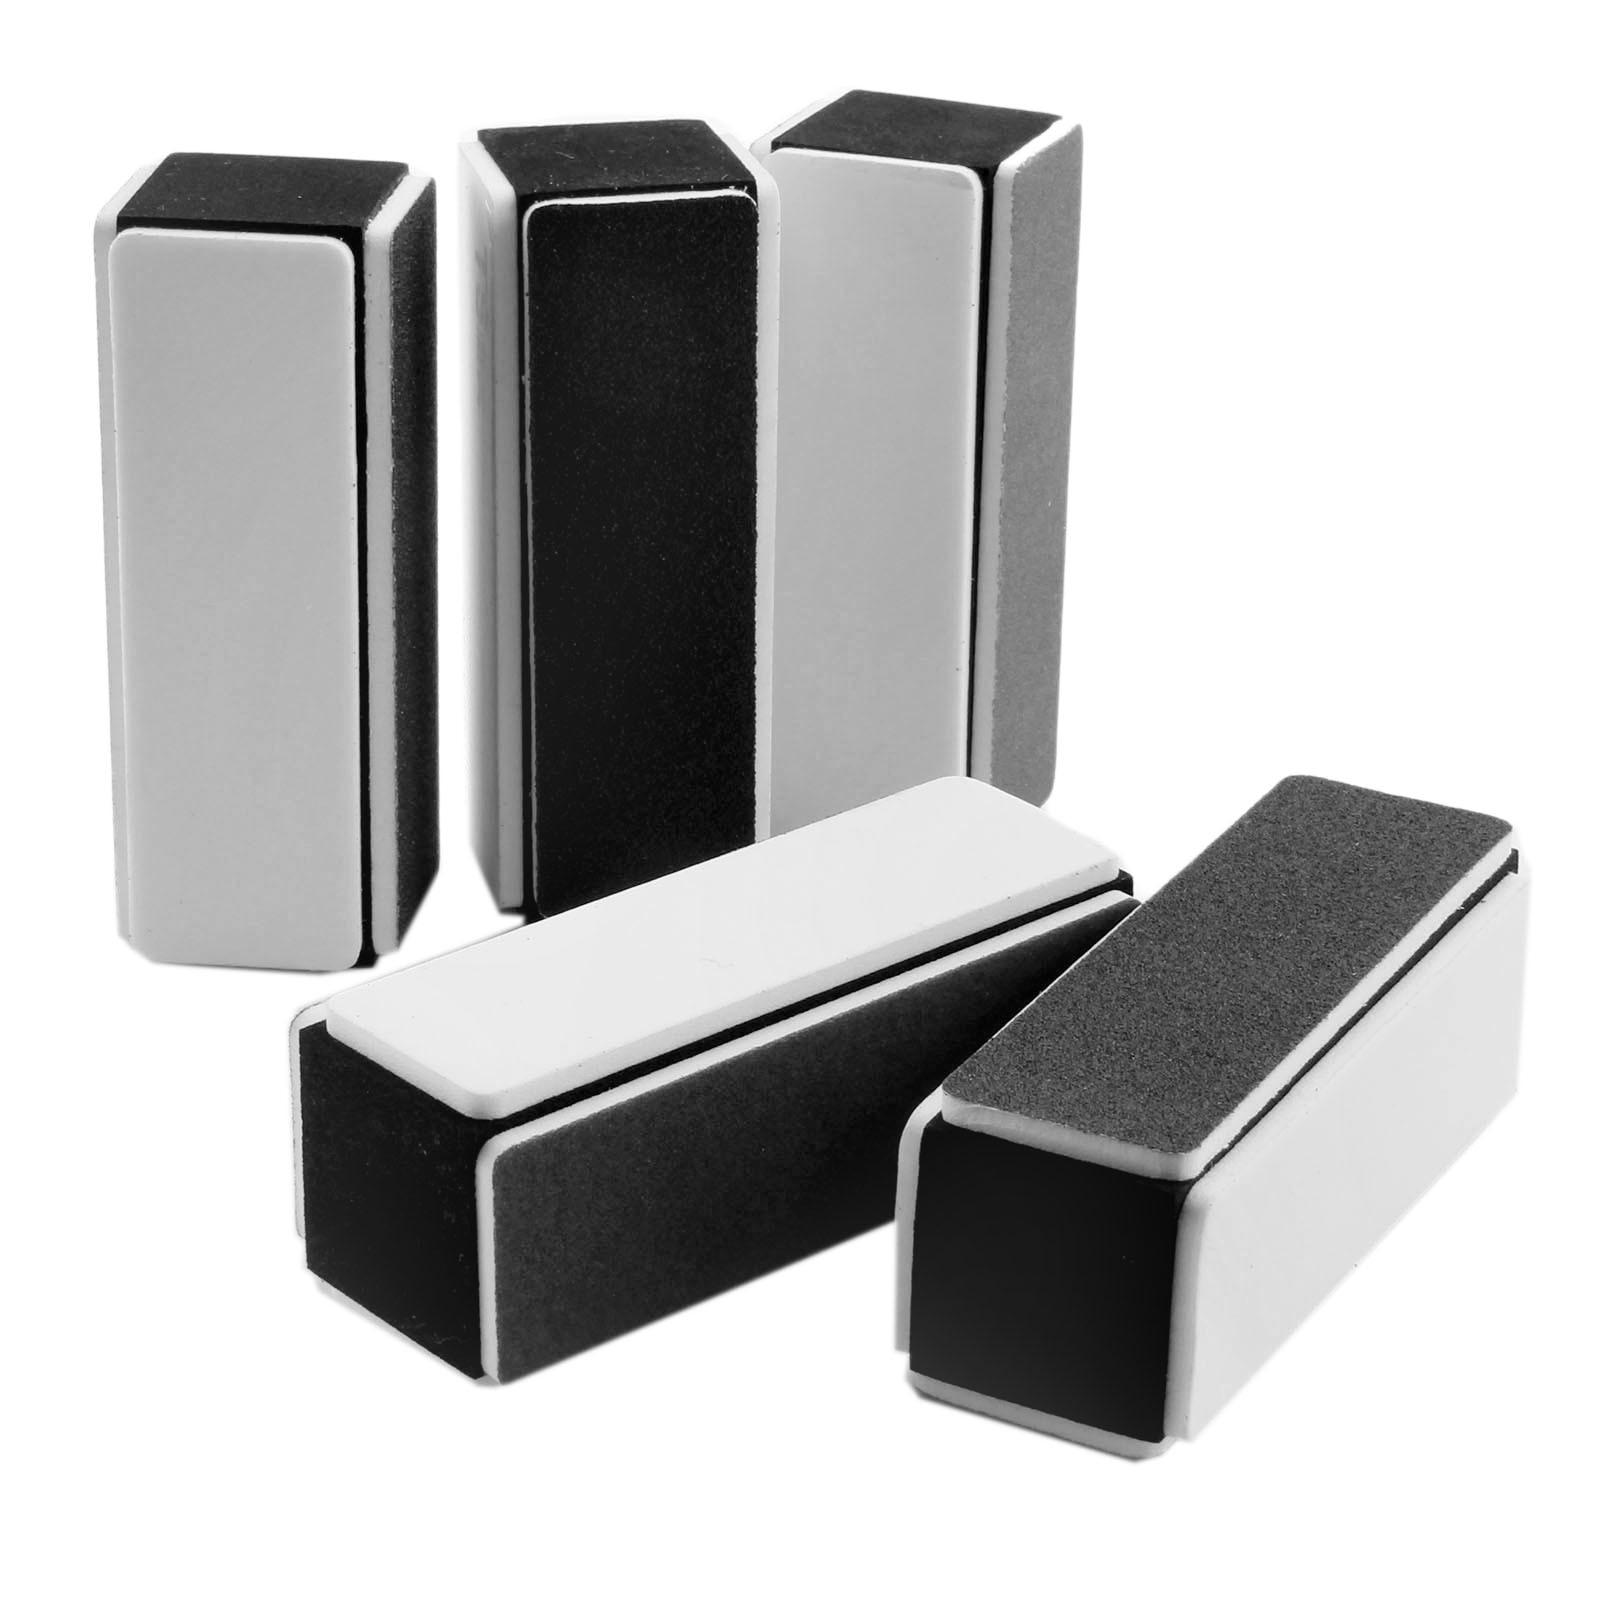 DRELD 5Pcs/lot Sanding Polishing Buffers 4 Way Sponge Buffer Polishing Block Grit 3000 400 240